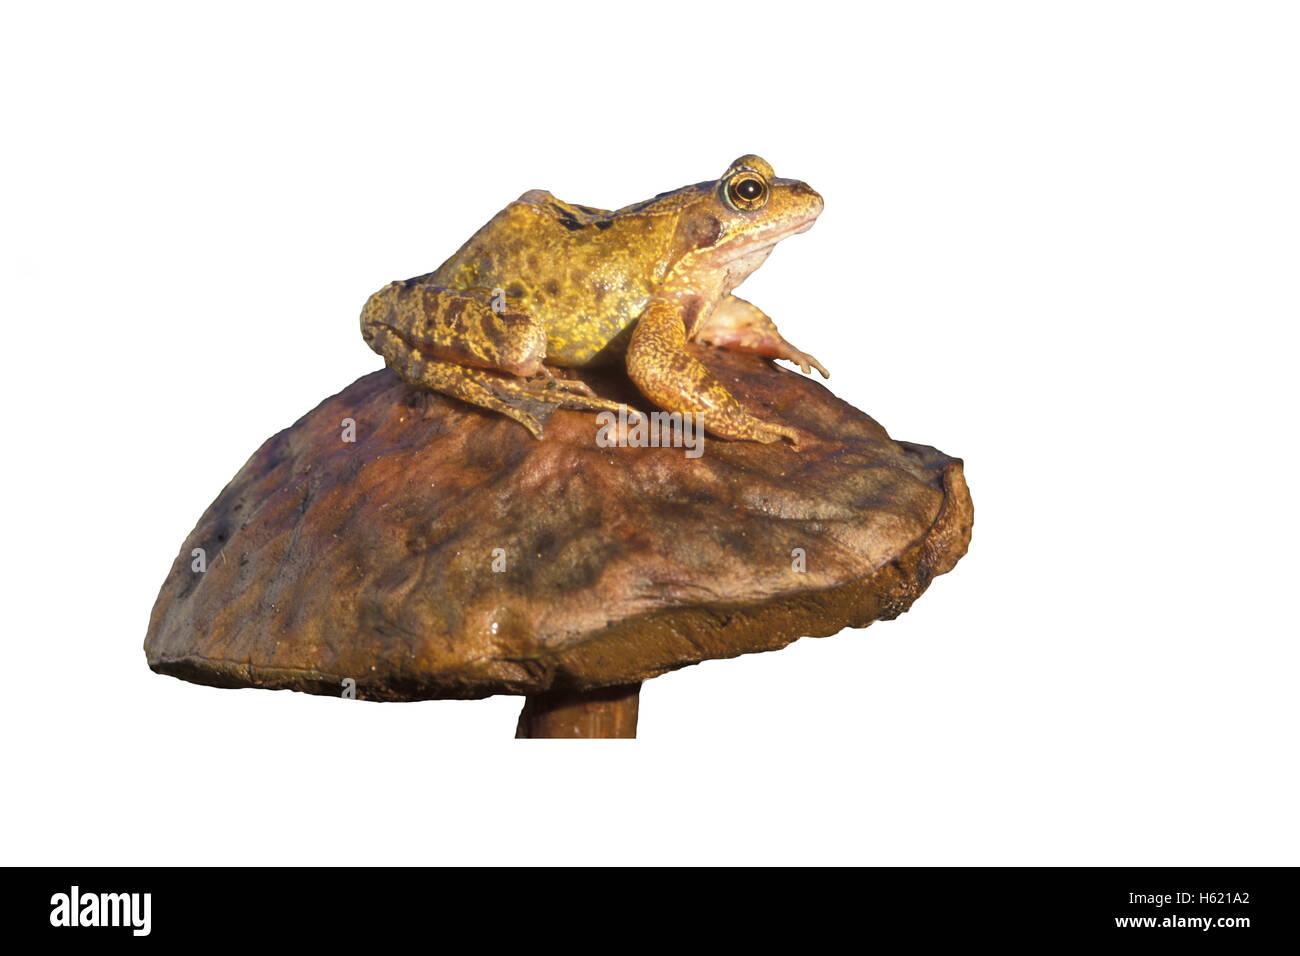 Common frog, Rana temporaria, single reptile on toadstool - Stock Image